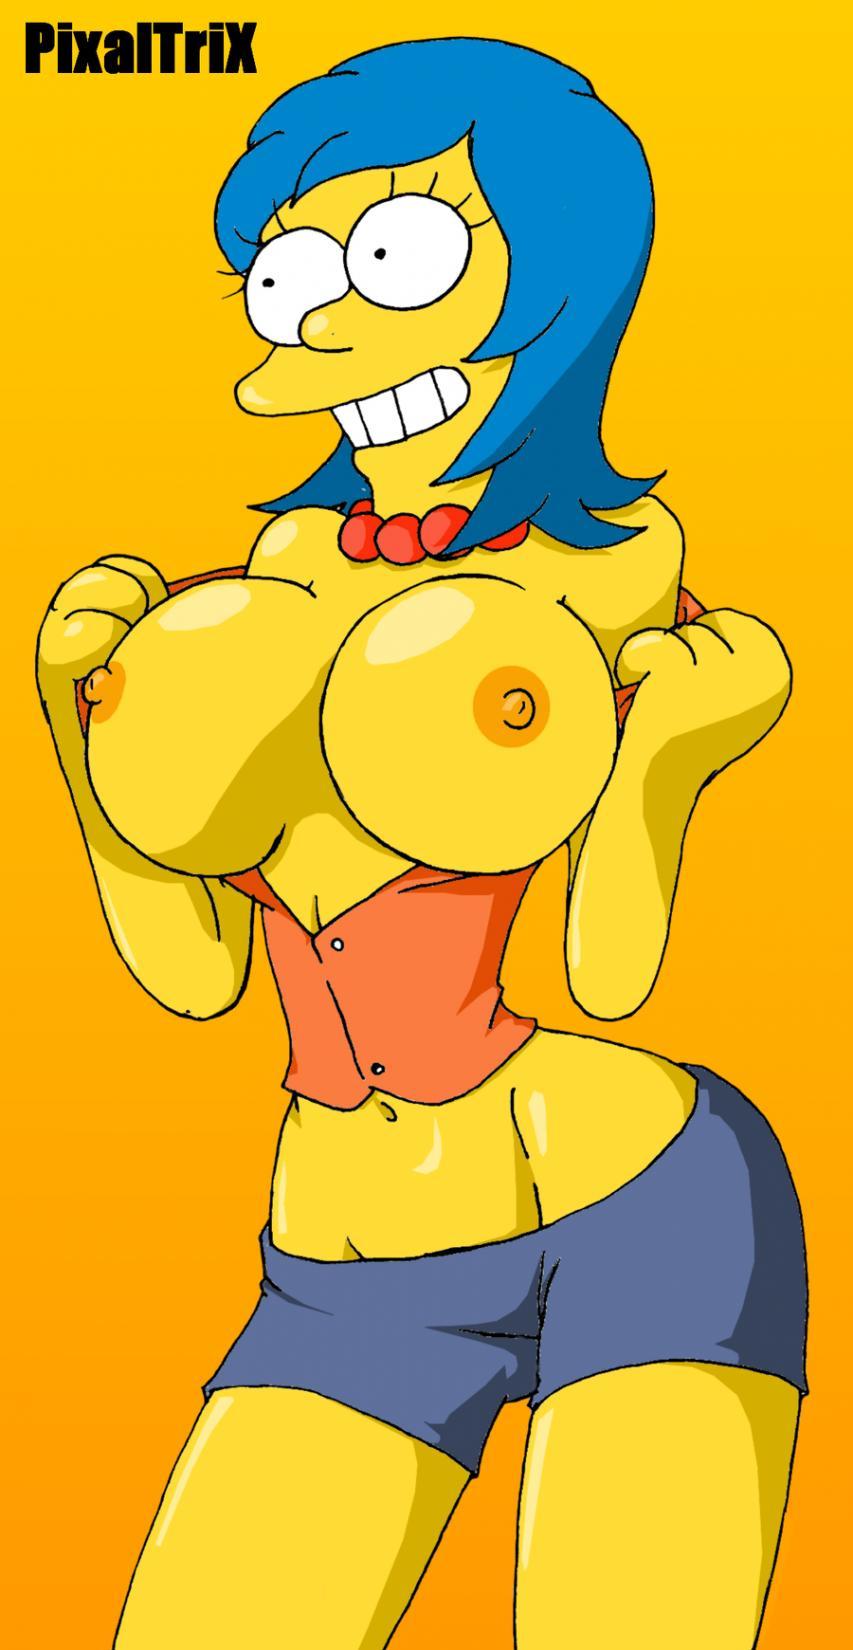 Galeria de Imagenes de Marge Simpson Desnuda